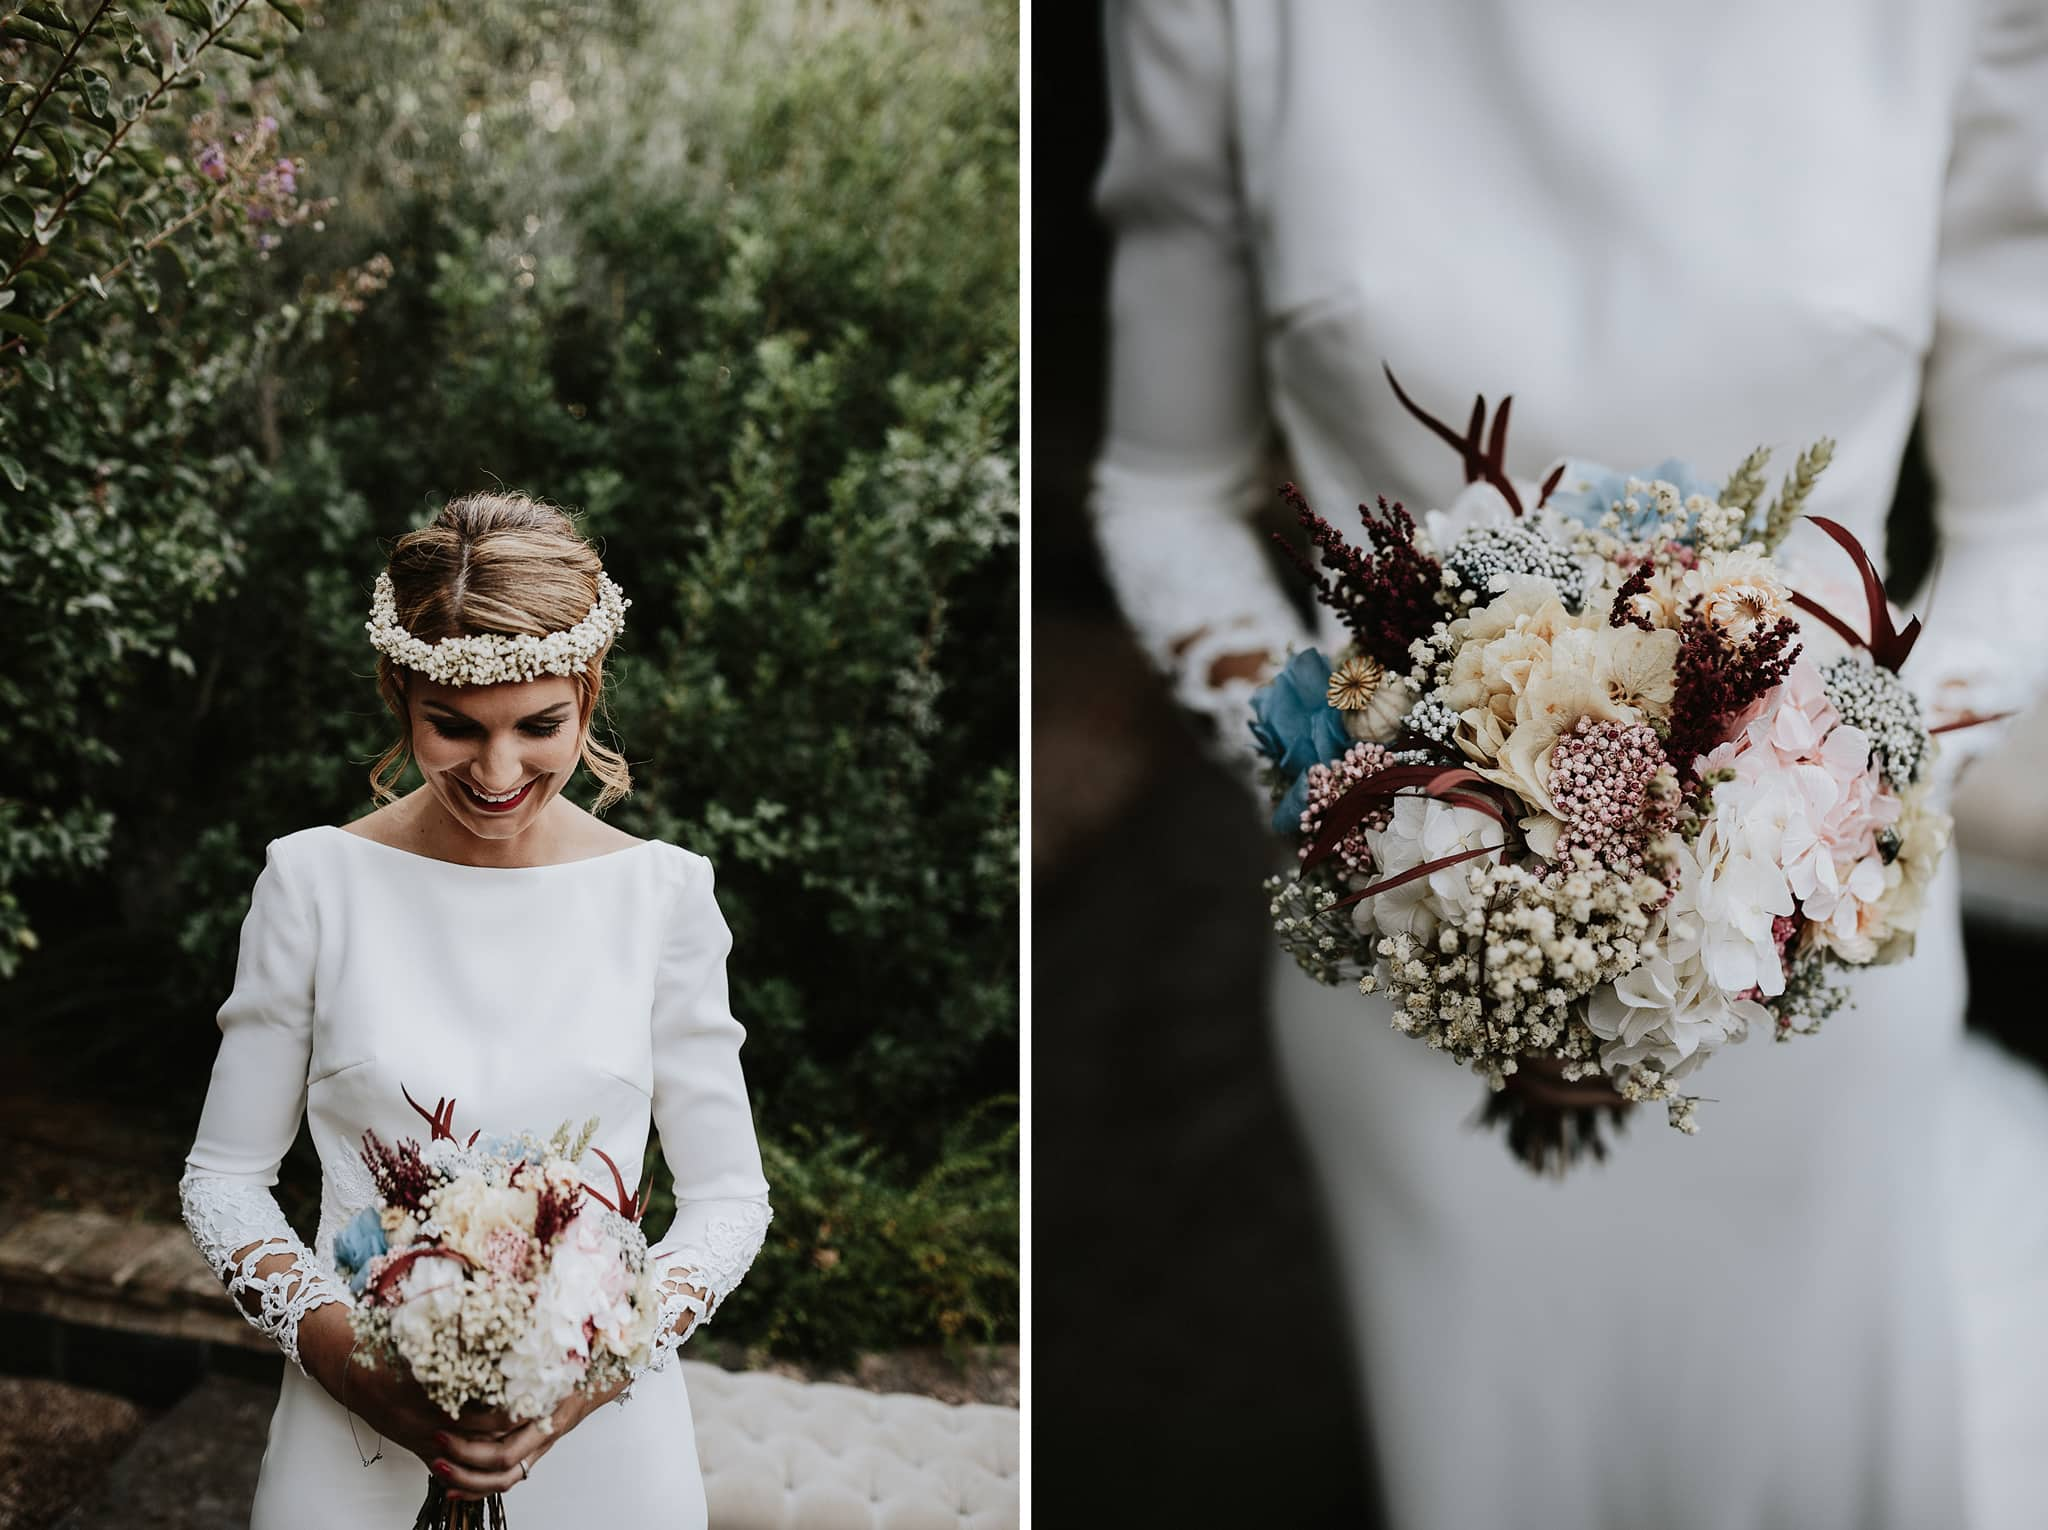 prisma-blanco-fotografos-bodas-toledo-57